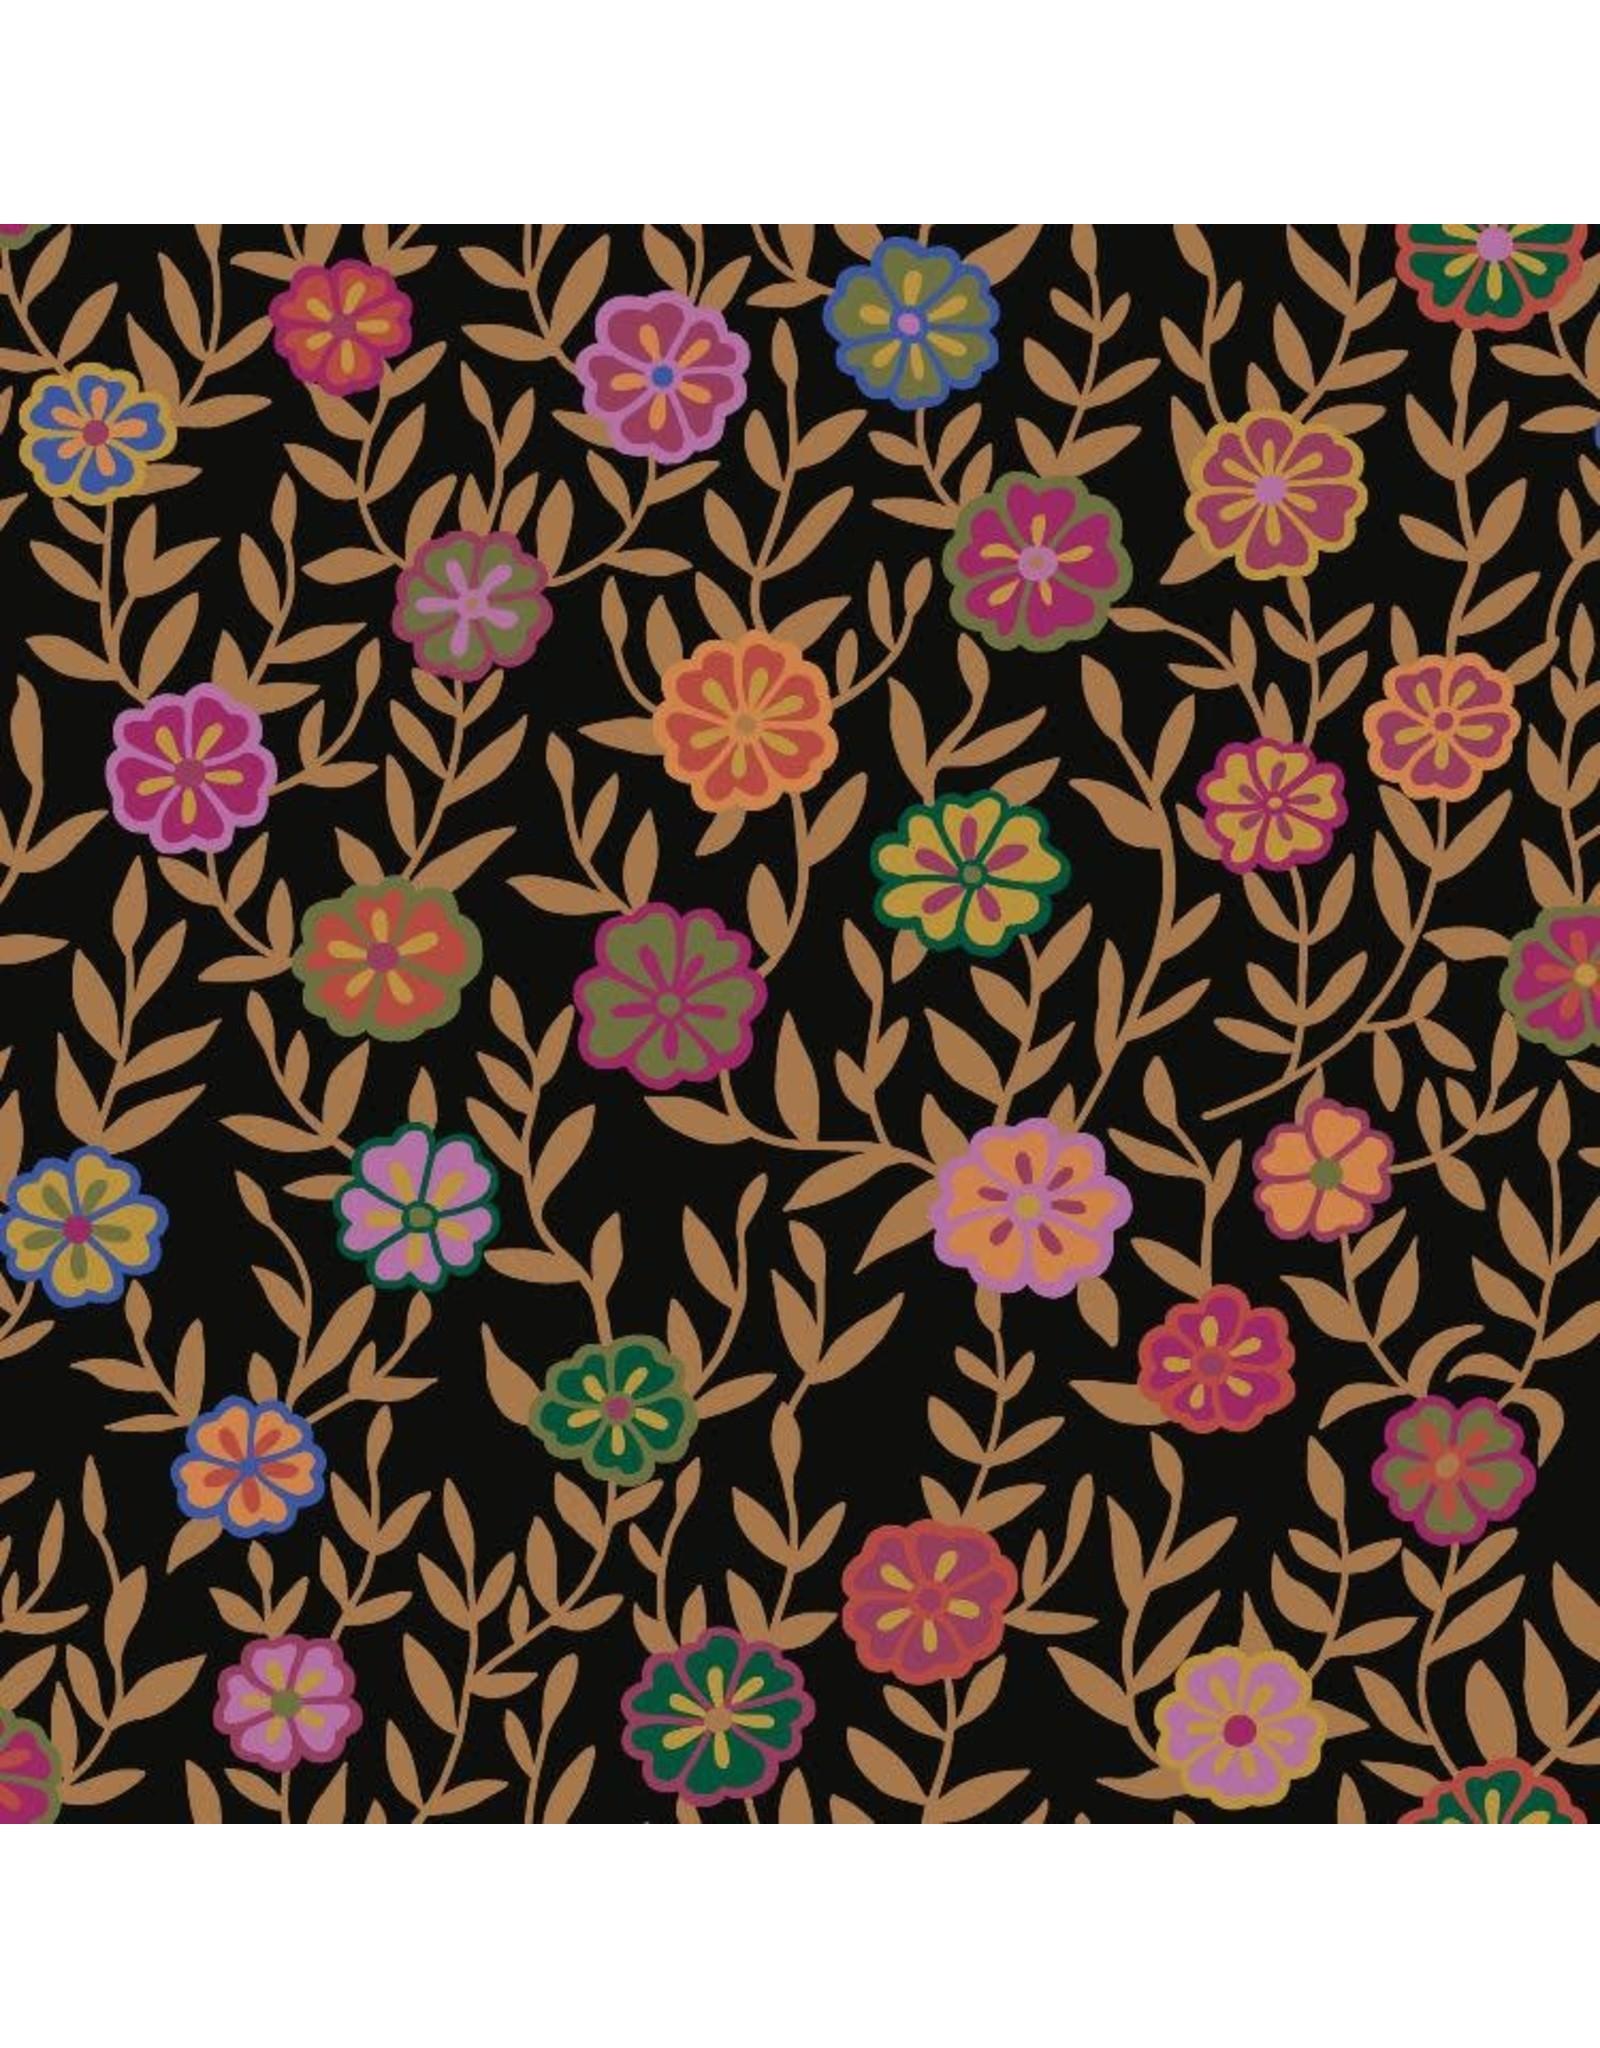 Kaffe Fassett Kaffe Collective 2020, Busy Lizzy in Black, Fabric Half-Yards  PWGP175